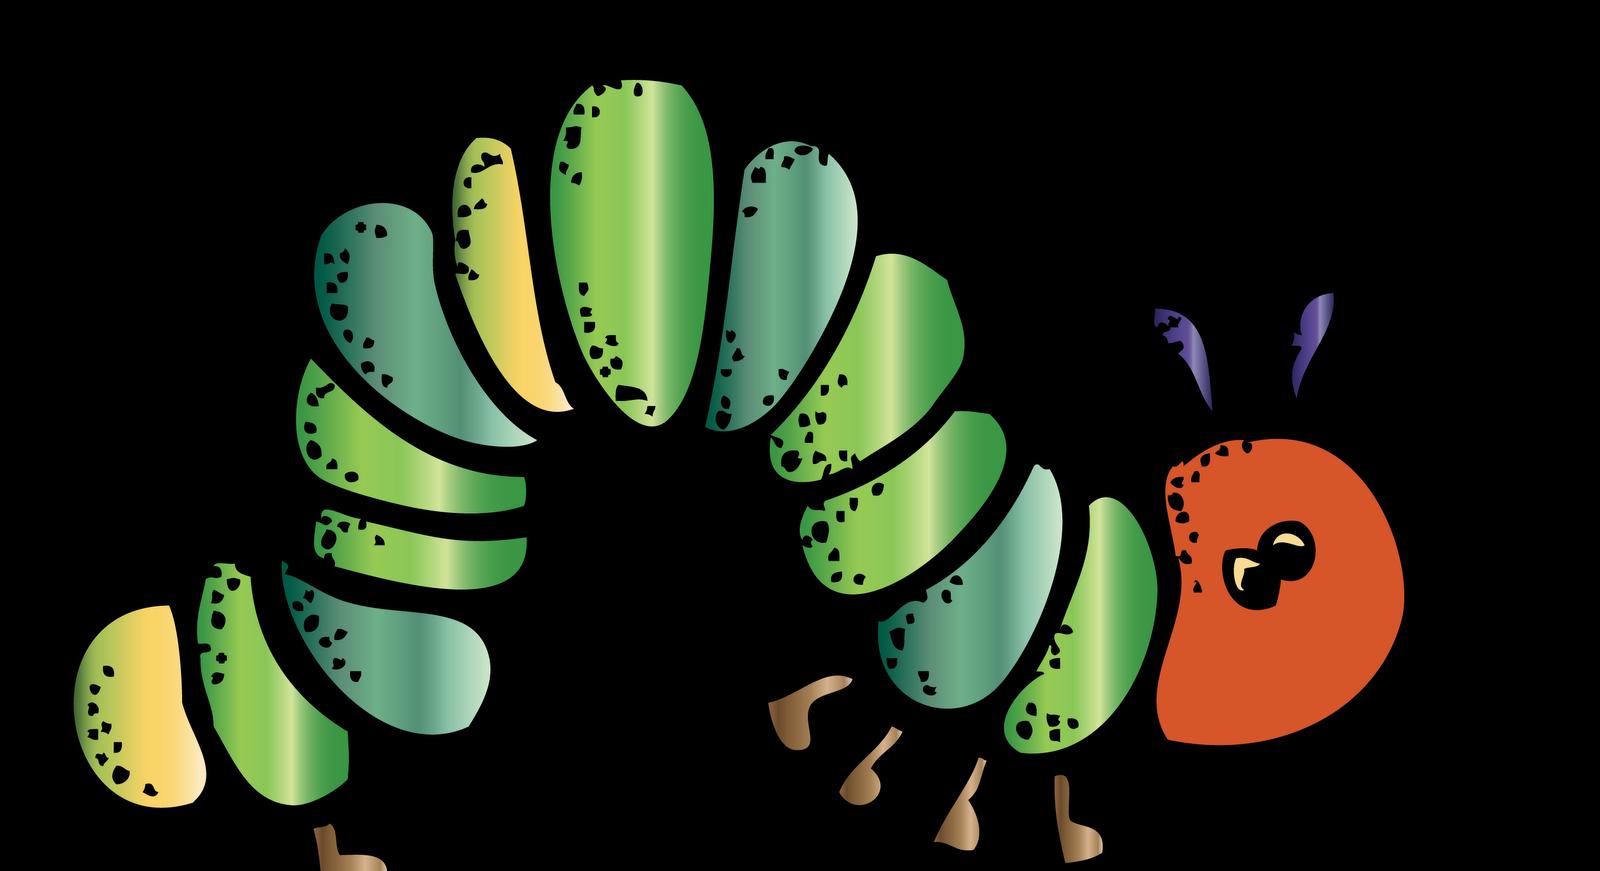 hlabithiotis – Hannah labithiotis